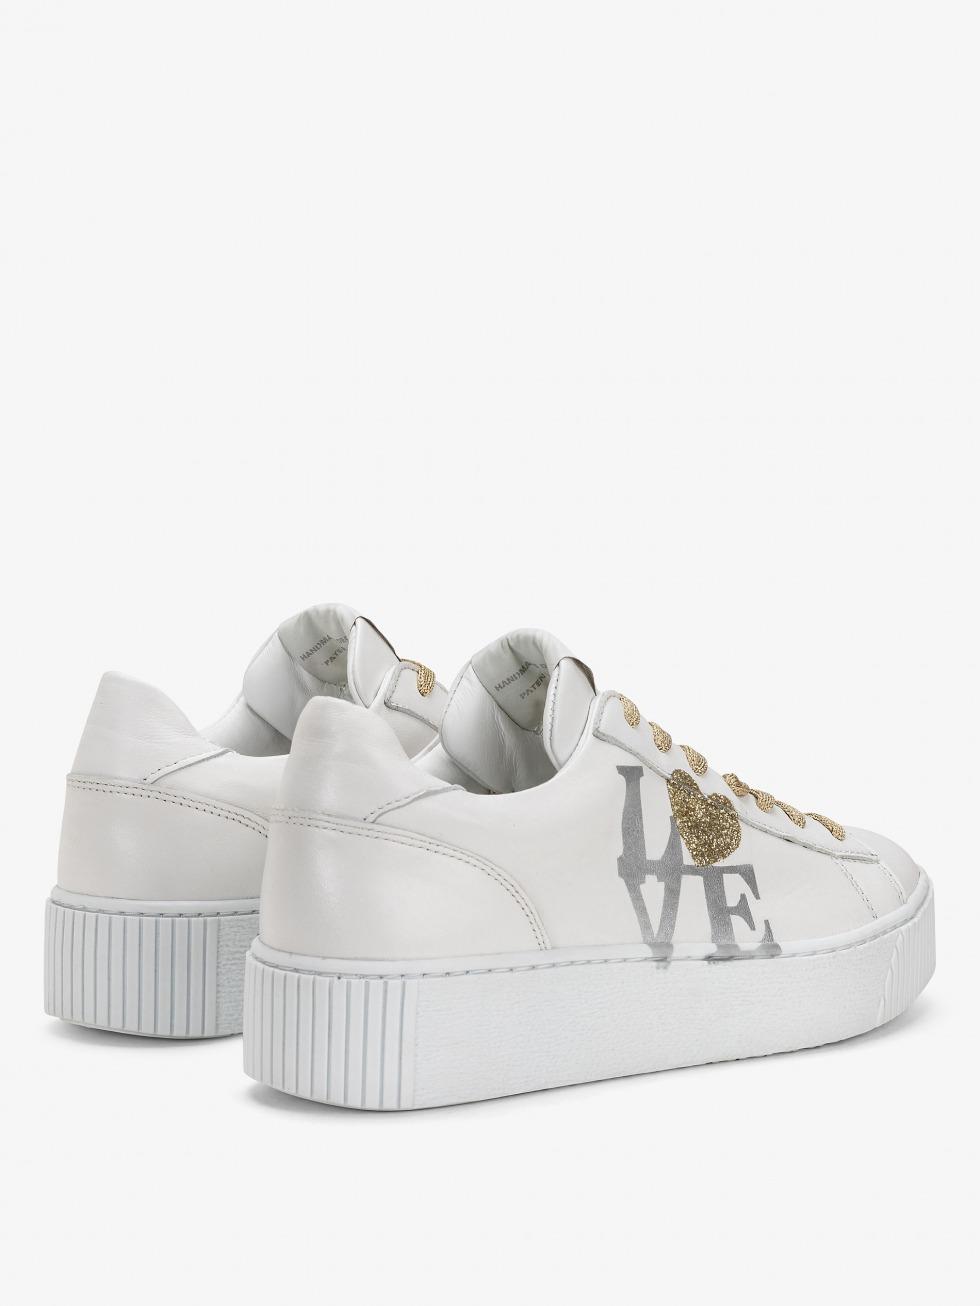 Cosmopolitan Sneakers - Silver Heart